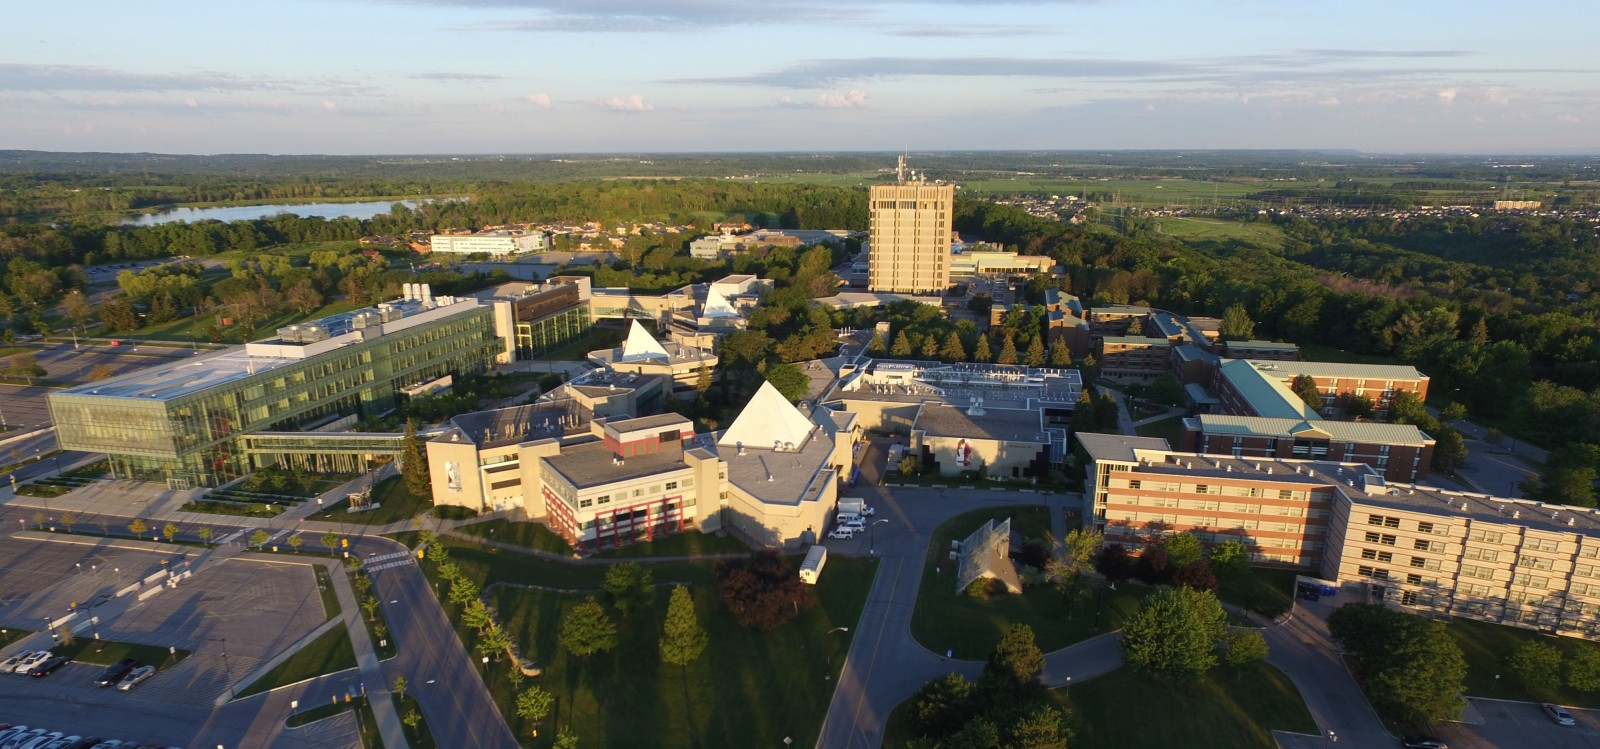 Restaurants & Cafes for Students at Brock University